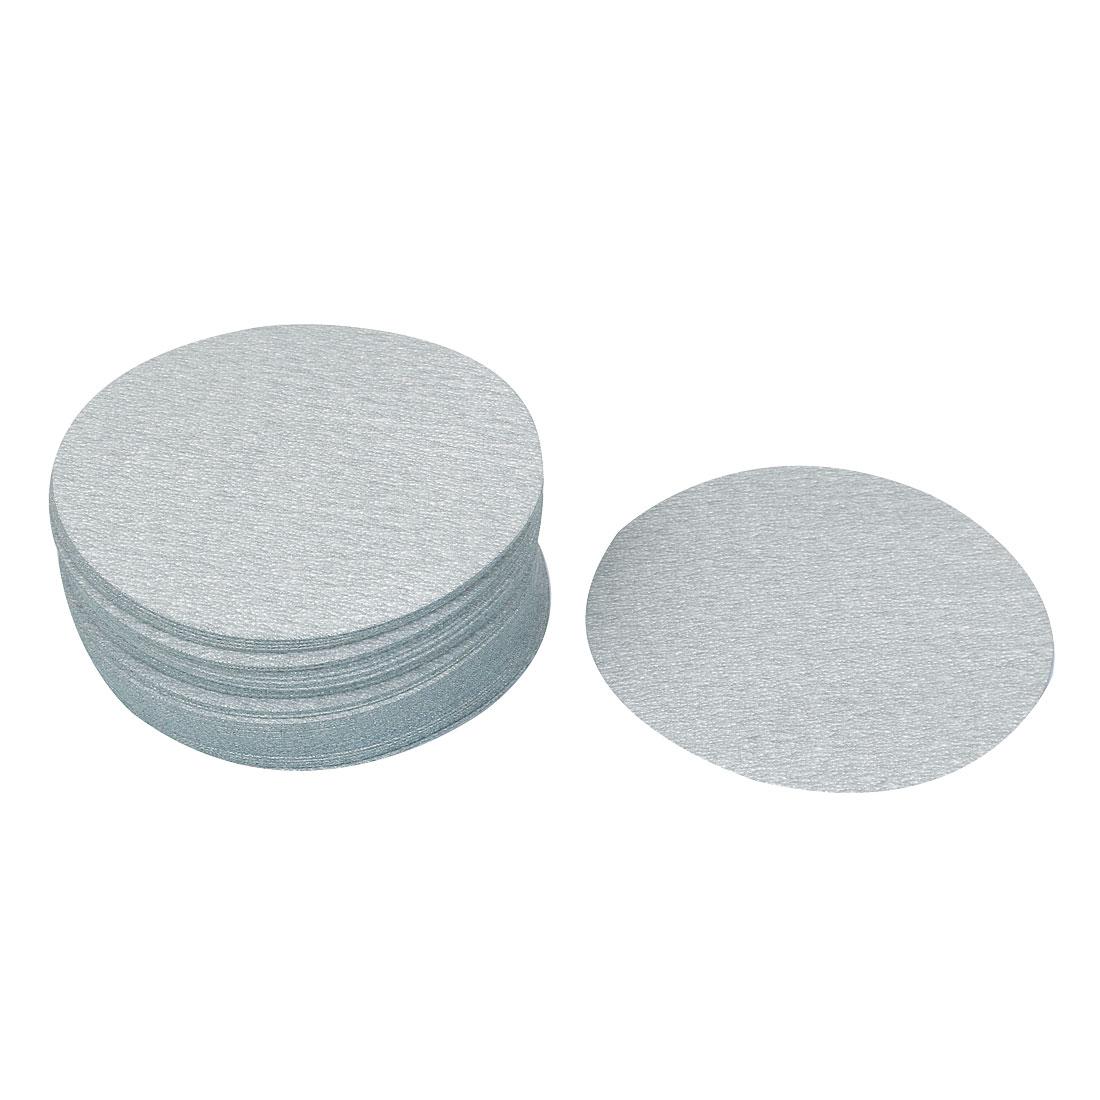 "5"" Dia Polishing Round Dry Abrasive Sanding Sandpaper Sheet Disc 400 Grit 50pcs"